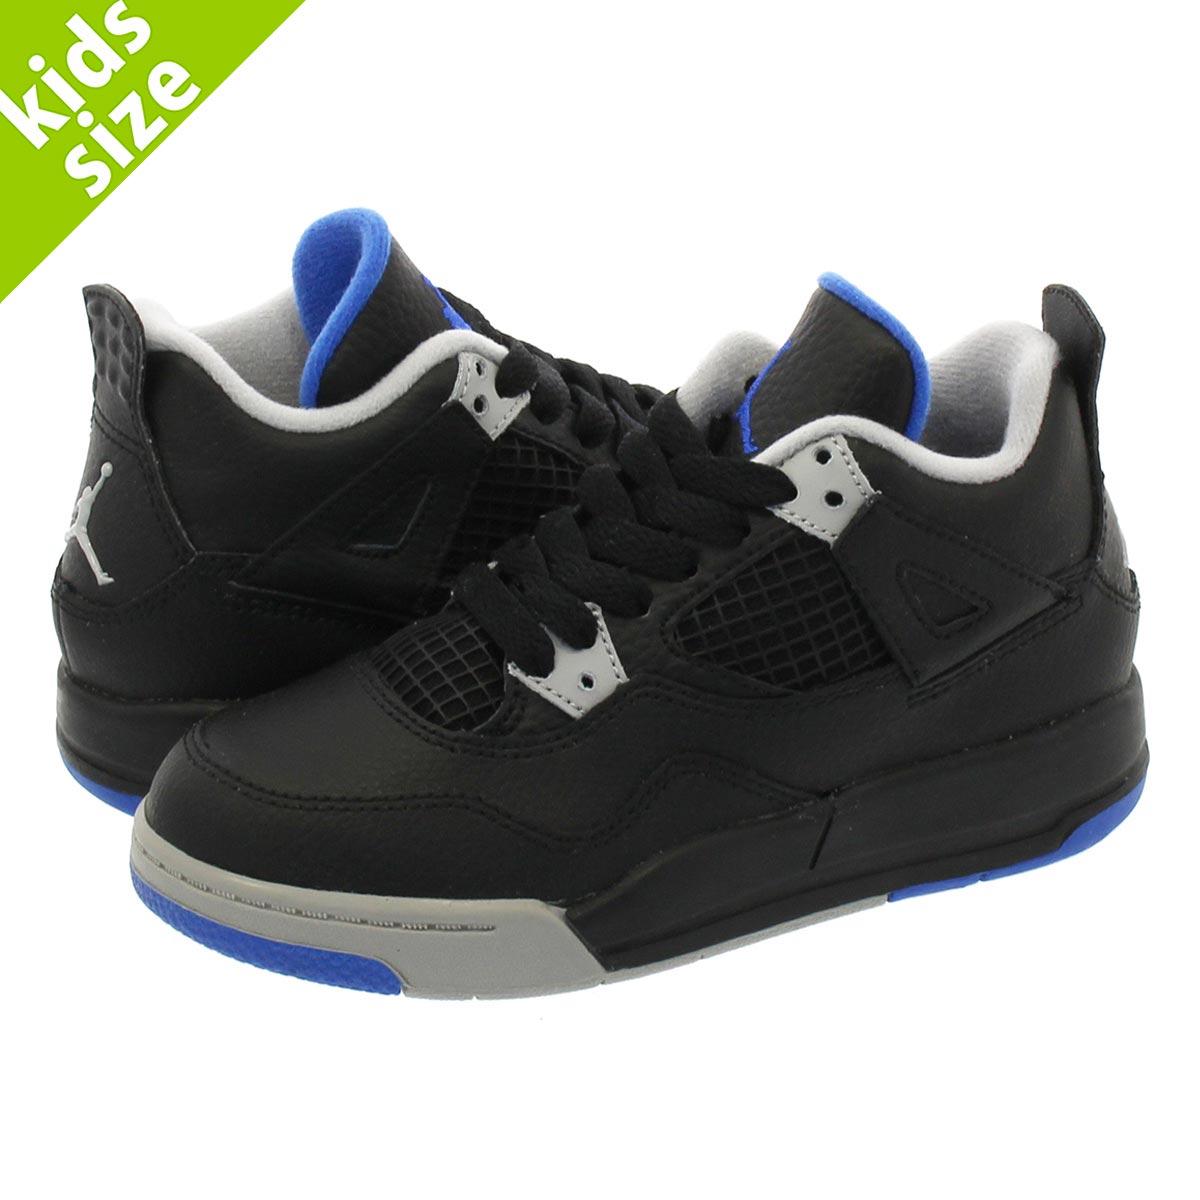 279b5d9e930 LOWTEX BIG-SMALL SHOP  NIKE AIR JORDAN 4 RETRO BP Nike Air Jordan 4  nostalgic BP BLACK SOAR MATTE SILVER WHITE 308